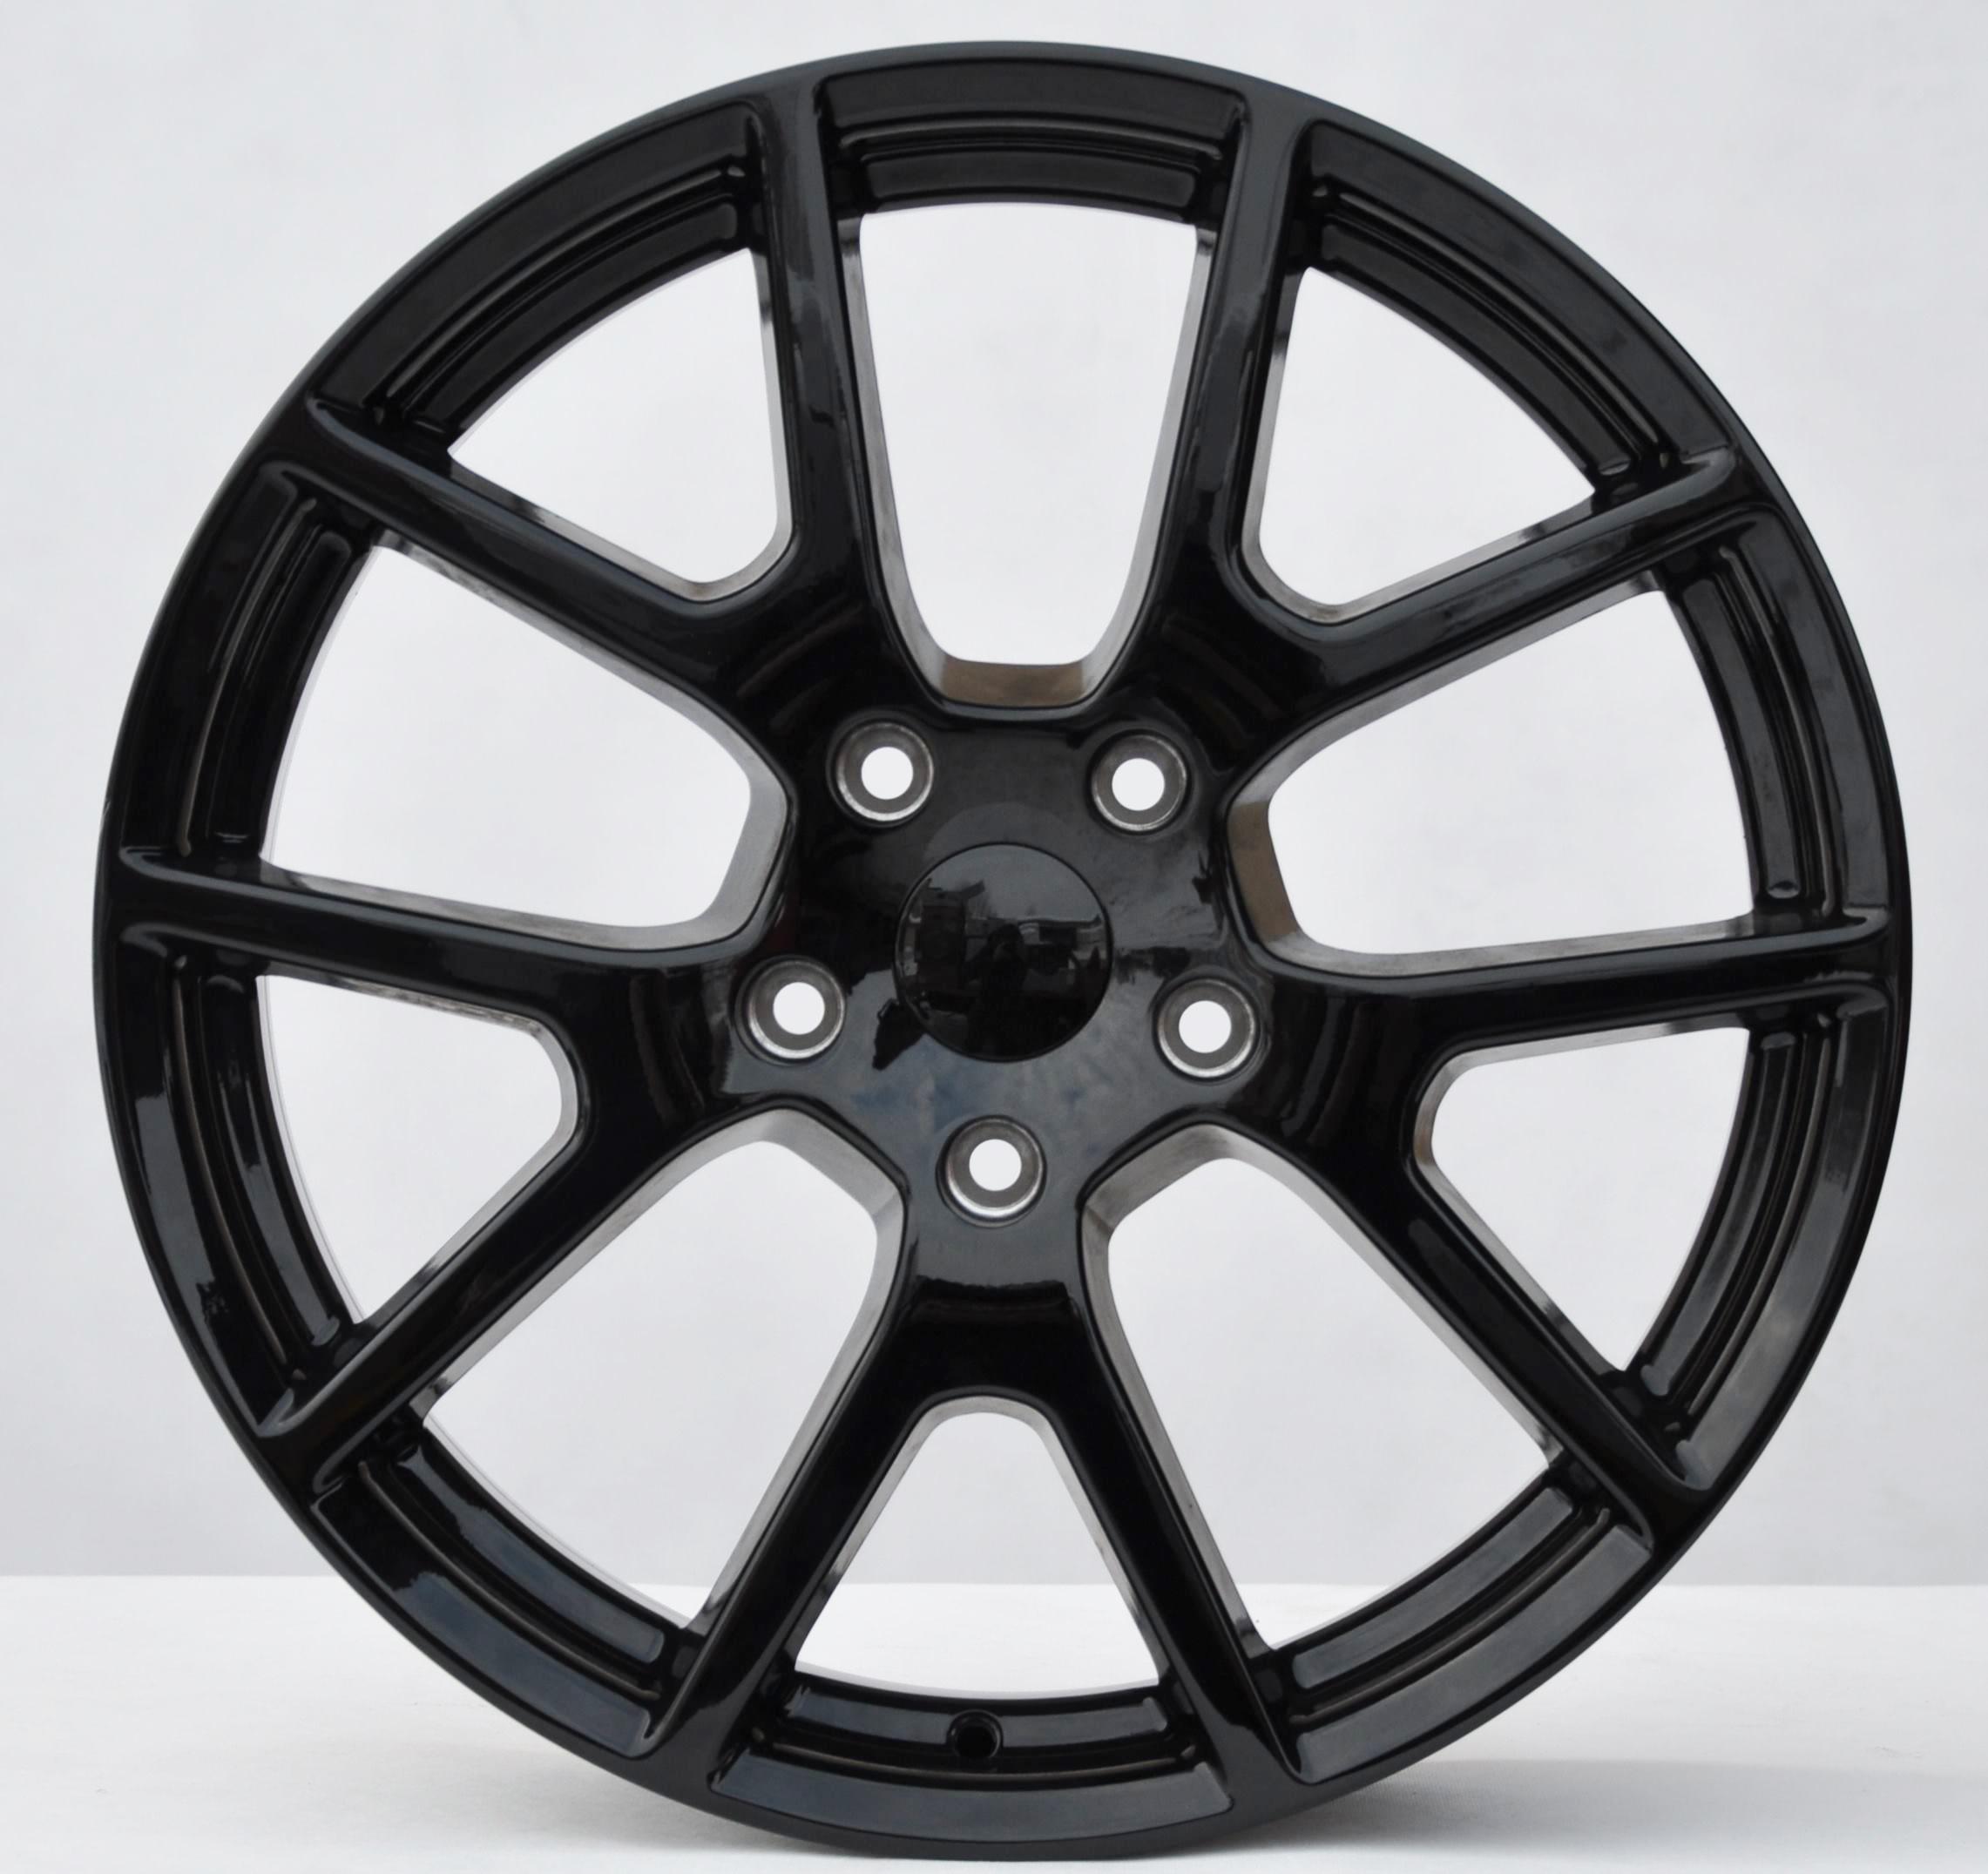 1386 B FELNI 19 5x127 FIAT FREEMONT CHRYSLER-1